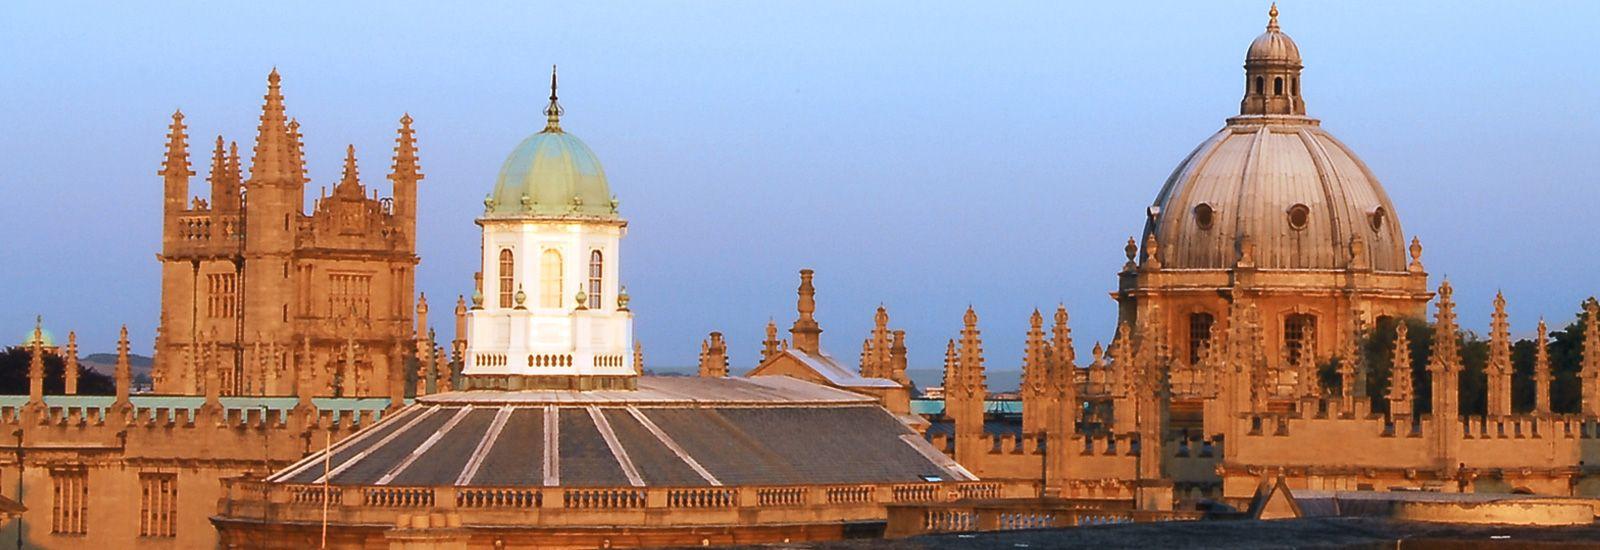 The Oxford skyline.